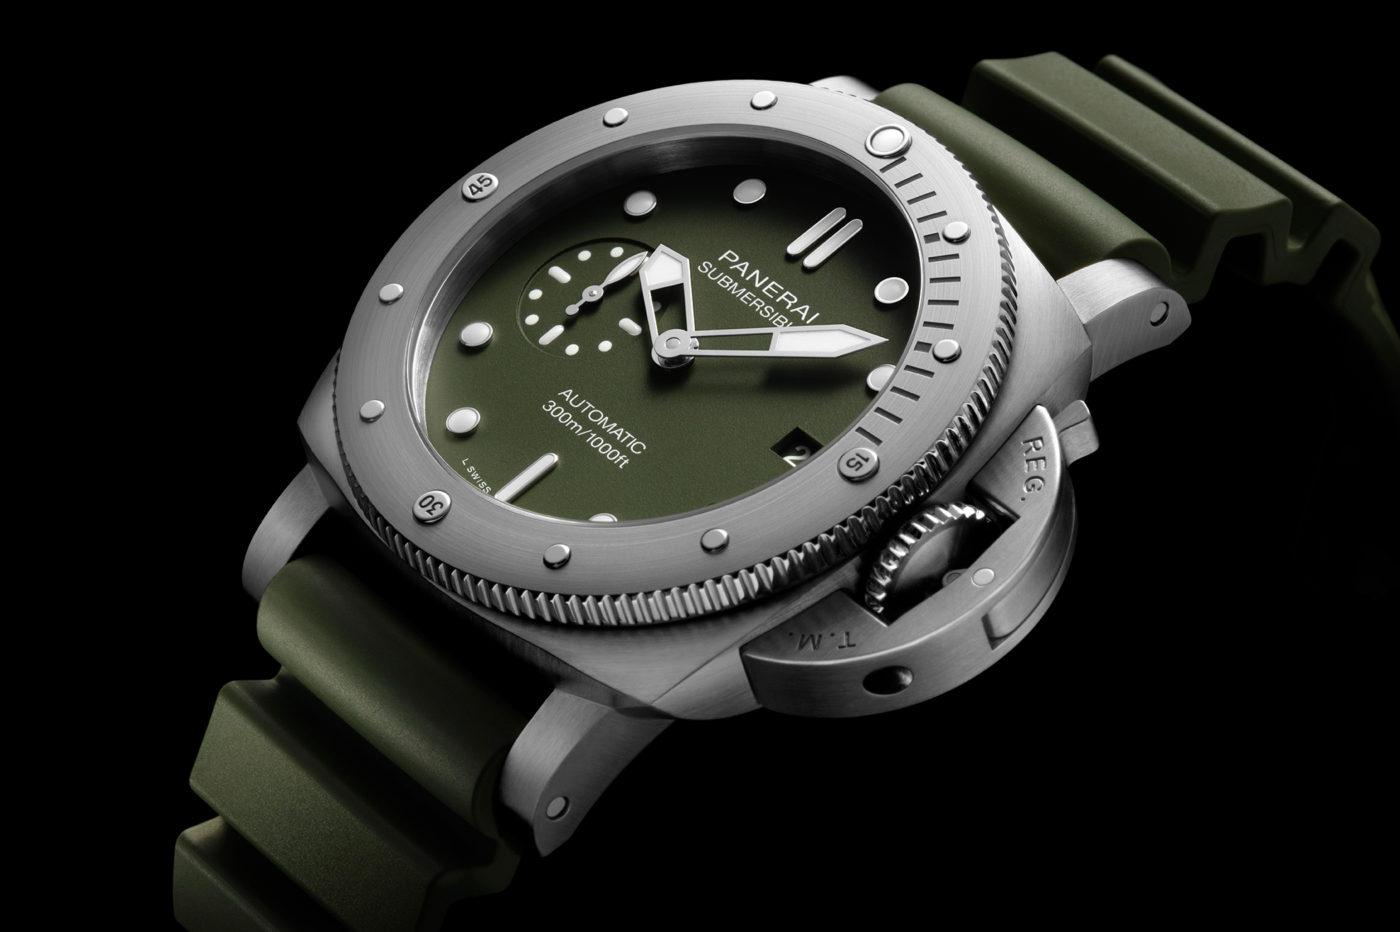 Panerai Submersible Verde Militare 42mm [dostępność, cena]